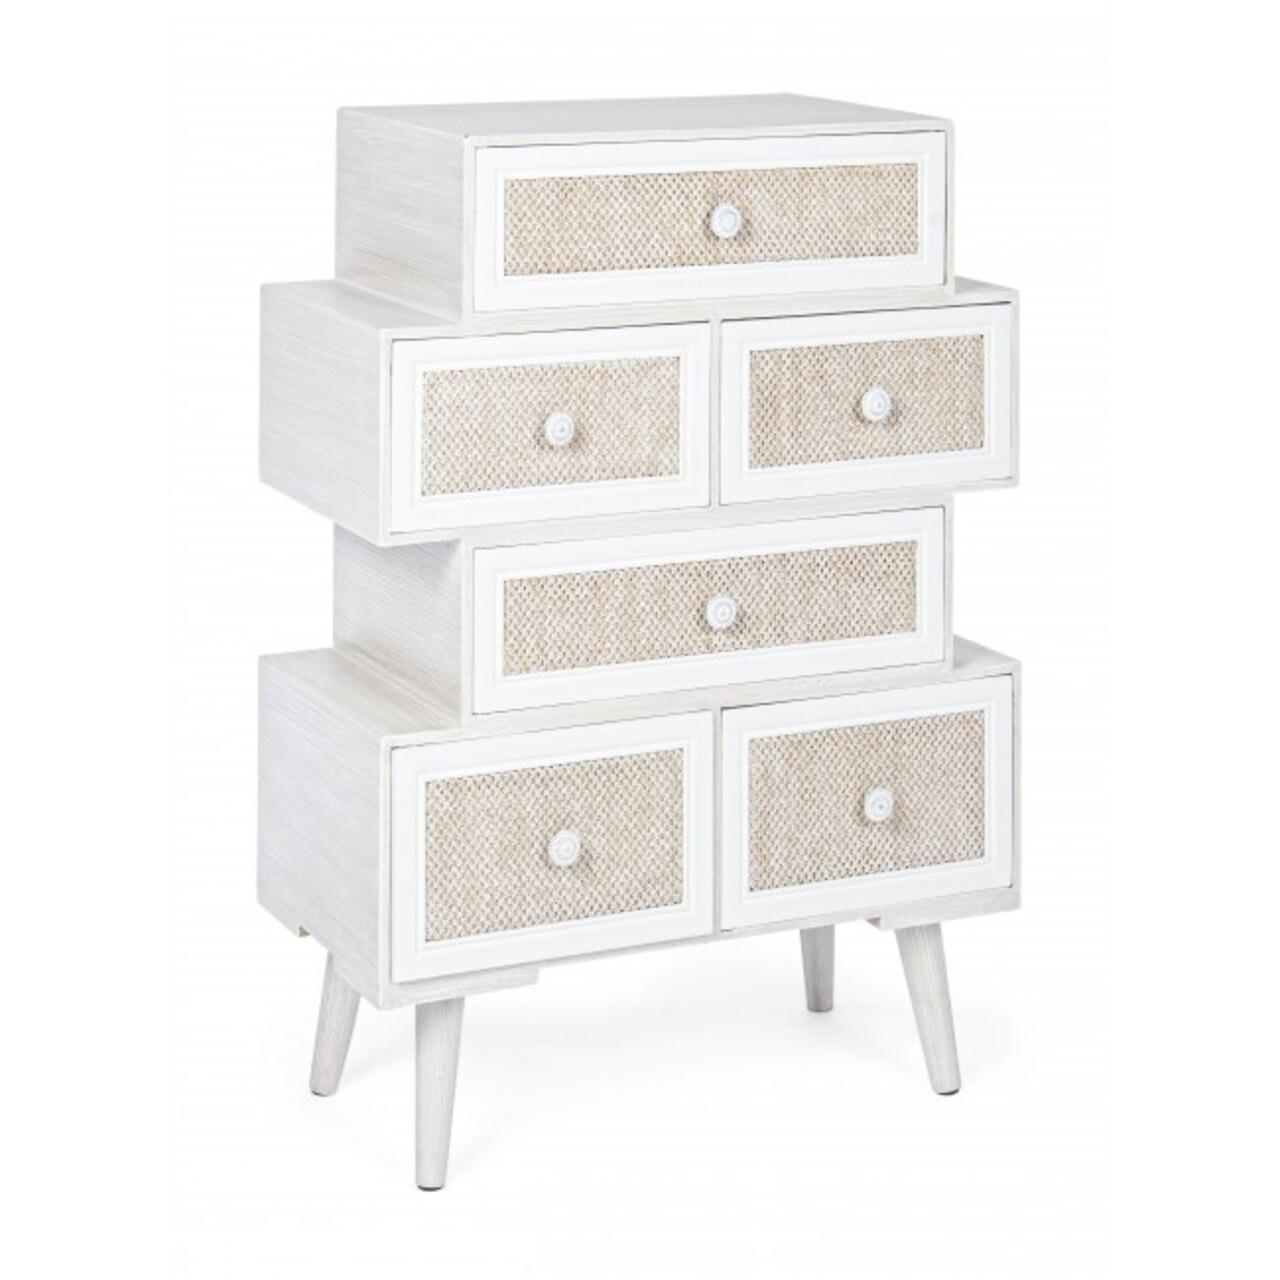 Comoda cu 5 sertare, Montiel, Bizzotto, 60x30x83 cm, lemn de pin